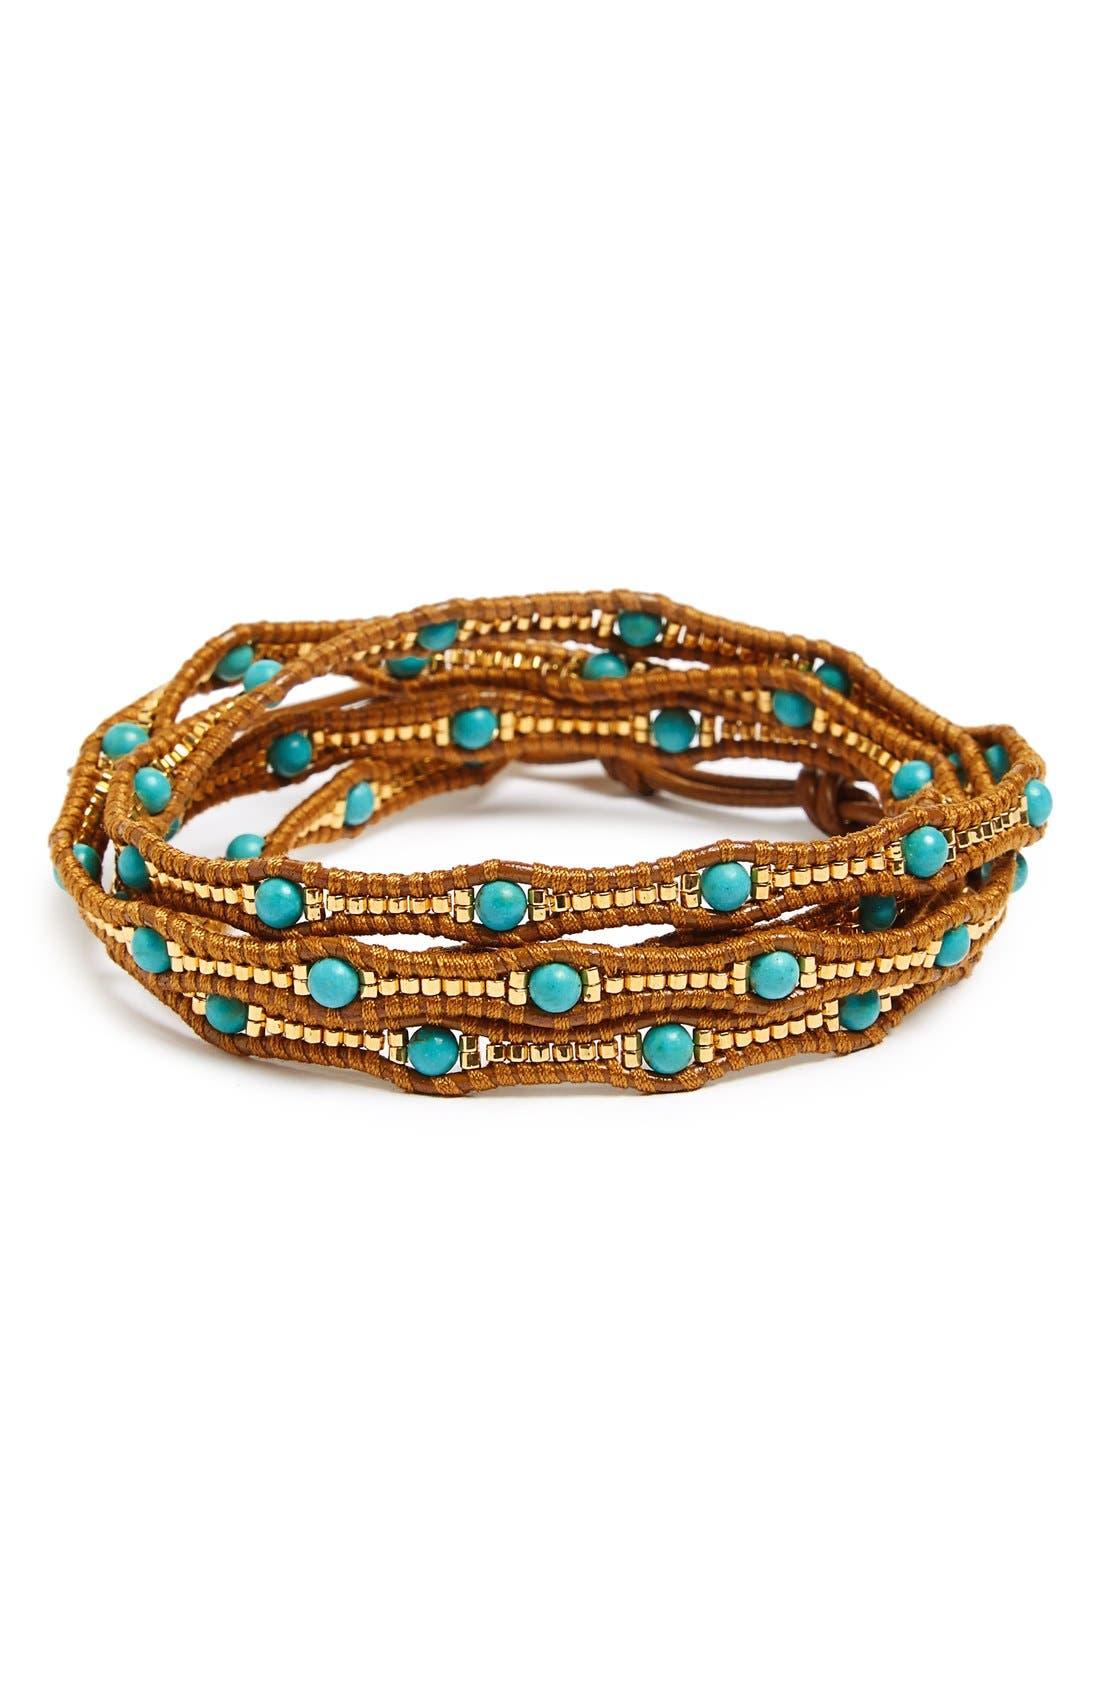 Alternate Image 1 Selected - Chan Luu Graduated Beaded Leather Wrap Bracelet